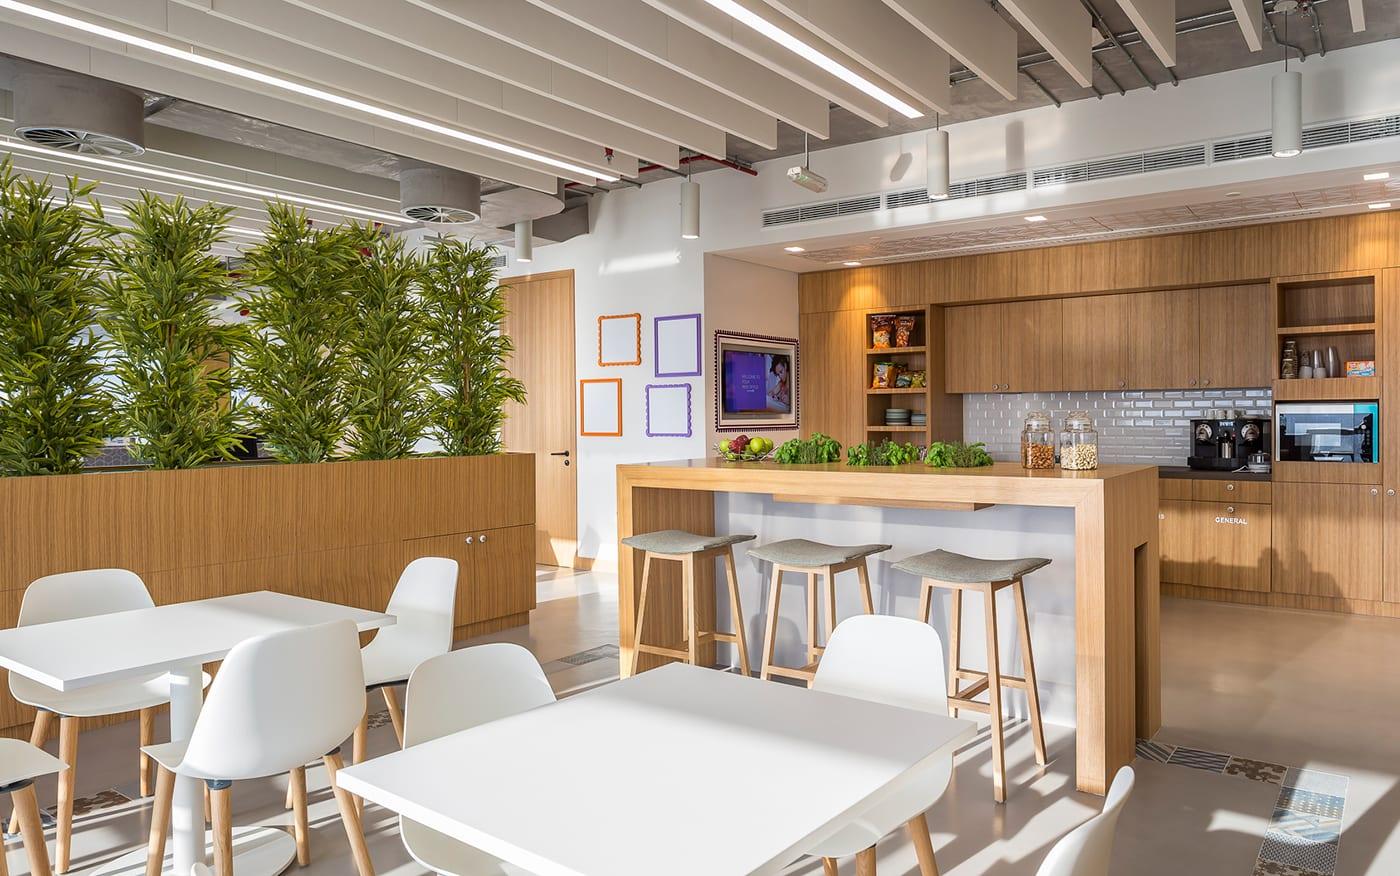 Interior Design by Perkins + Will seen at LinkedIn, Dubai, Dubai - Interior Design